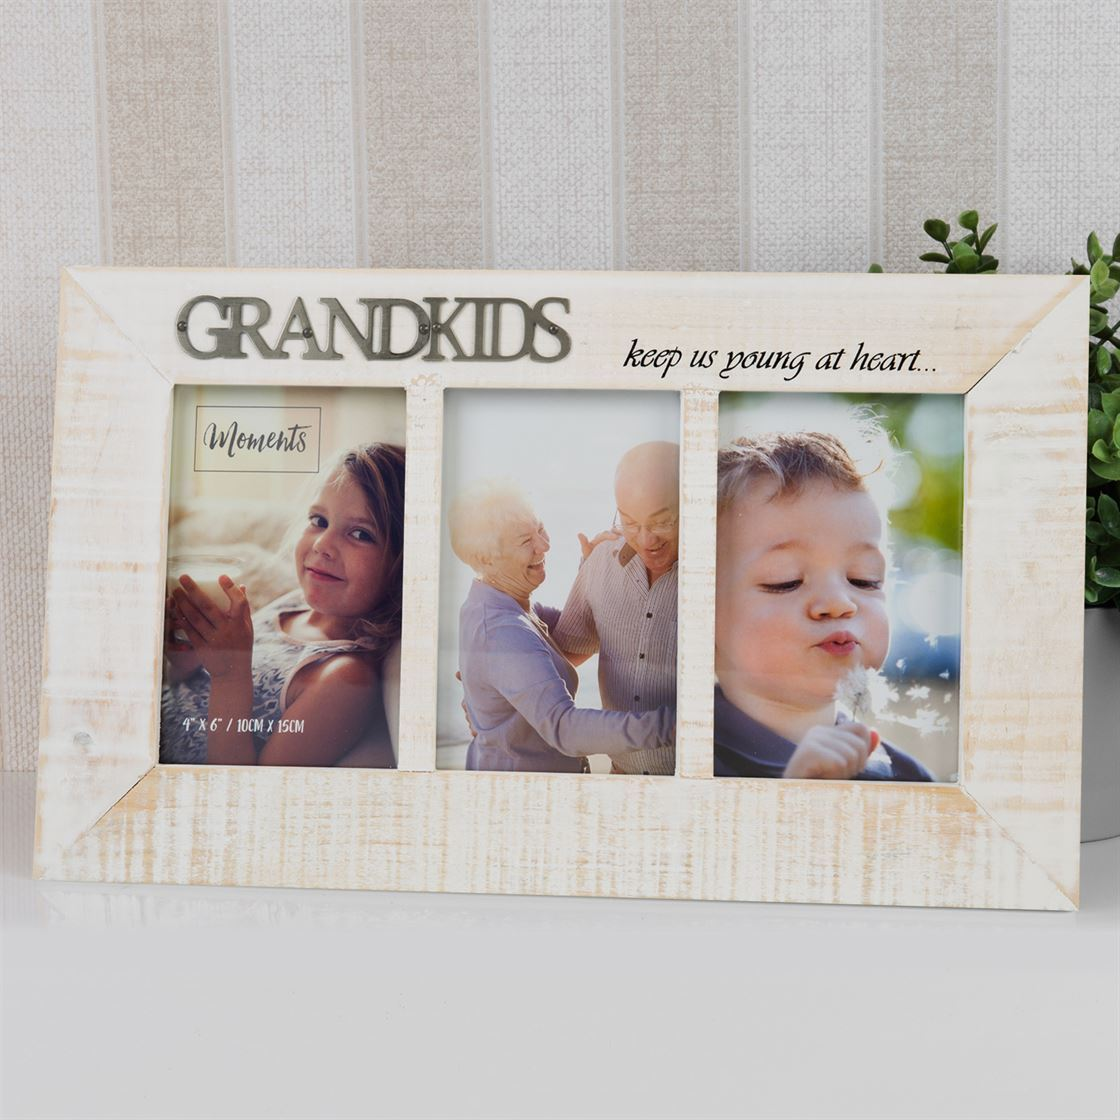 Moments Triple Photo Frame - Grandkids 4\' x 6\' 5017224744554   eBay